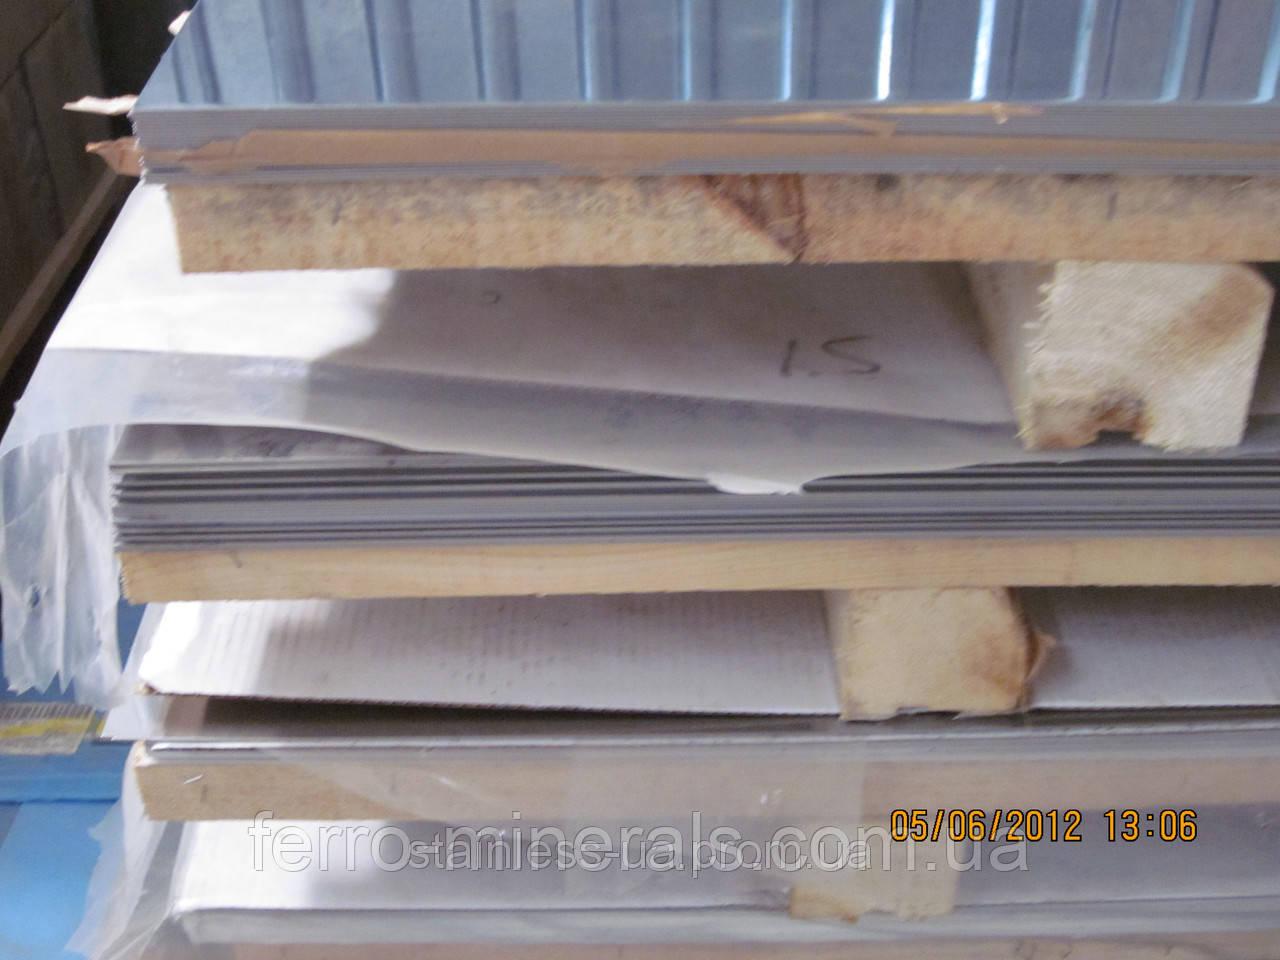 Нержавеющий лист 1,2х1250х2500мм, AISI 441 (08X17), 2В